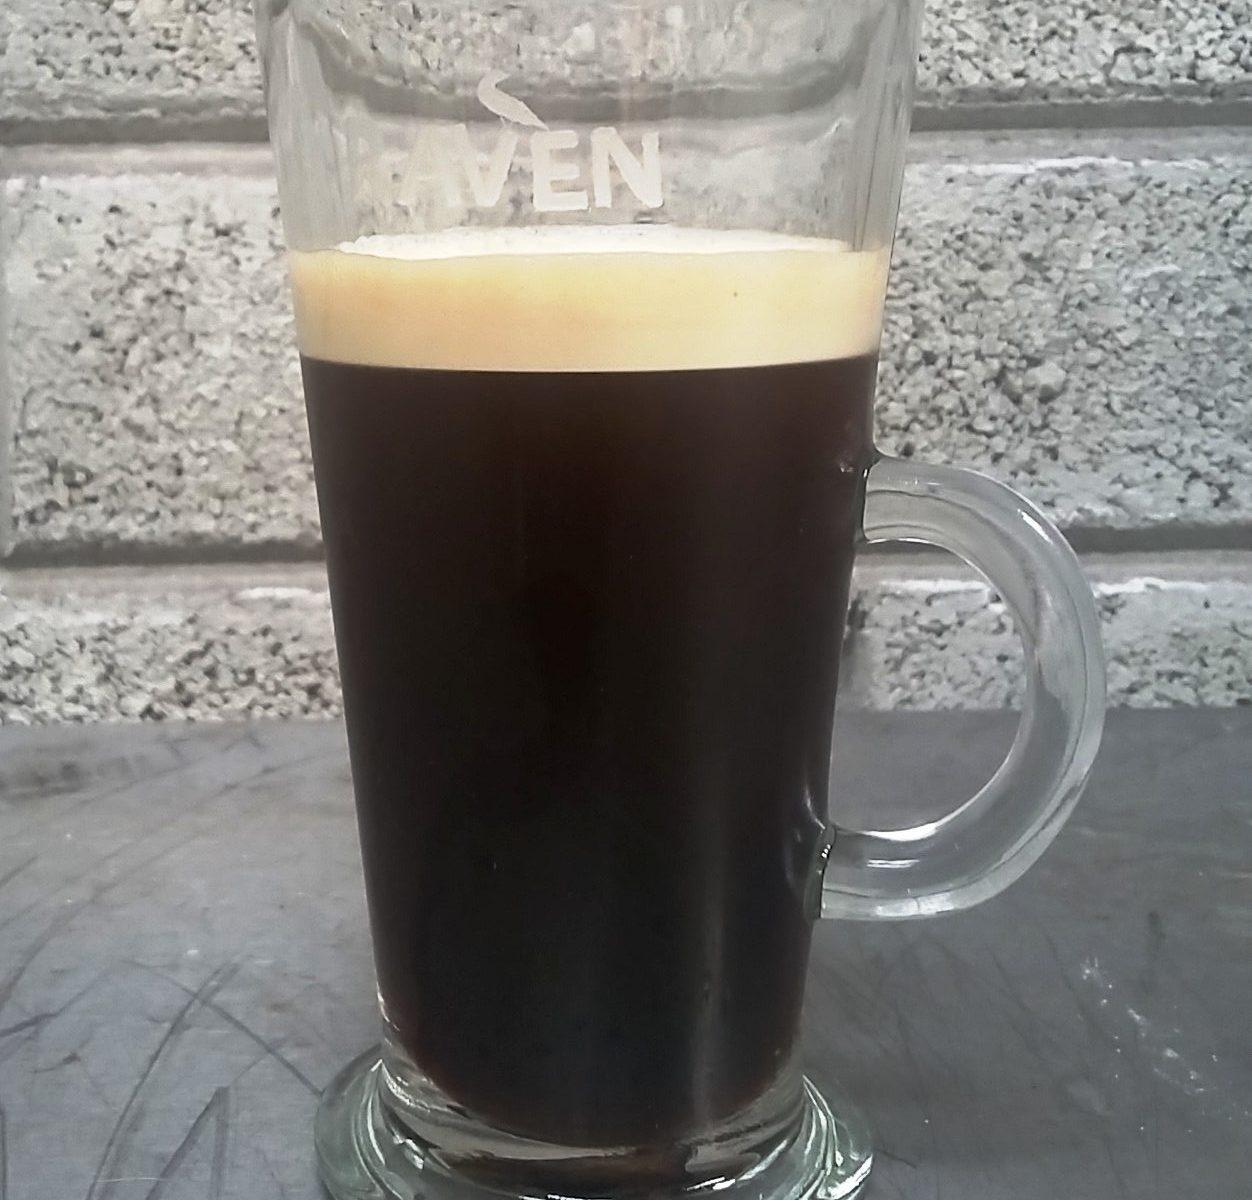 #nitrocoffee #coldbrewcoffee #ravennitrocoffee #Londoncoffee #Londoncoffeeshops #Amsterdam #Amsterdamcoffeeshops #Ibiza #Ibizacoffee